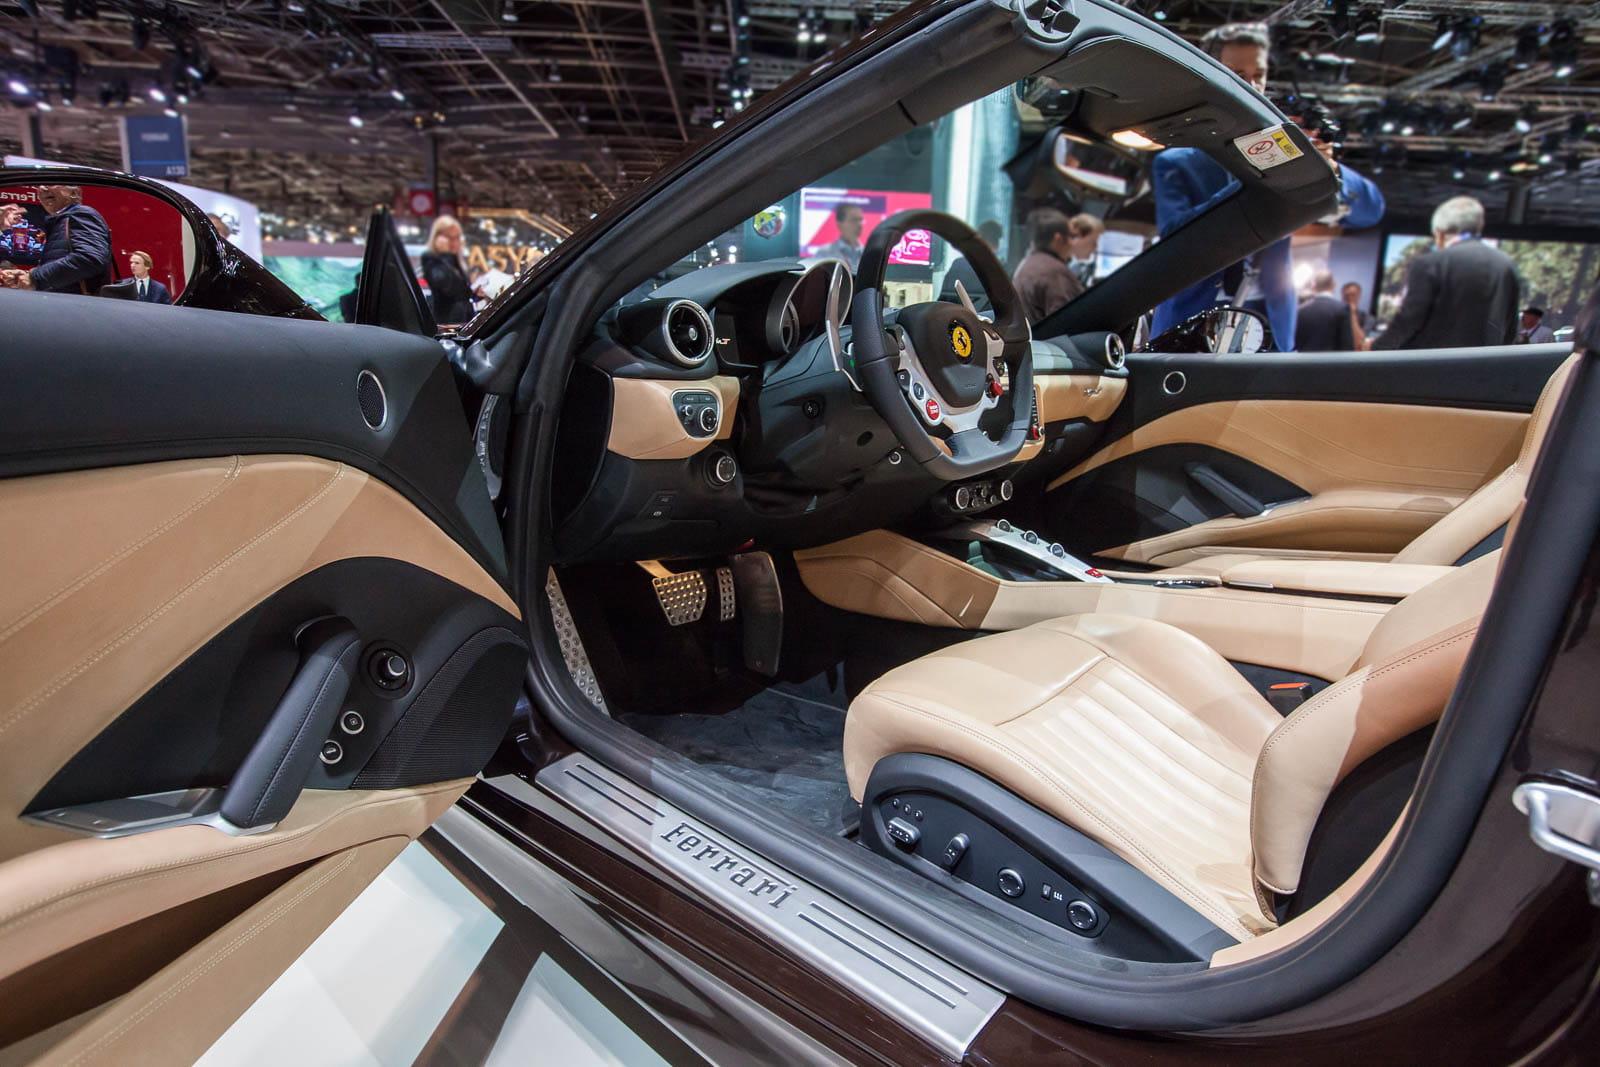 Un int rieur aussi retravaill ferrari porsche for Interieur voiture de luxe